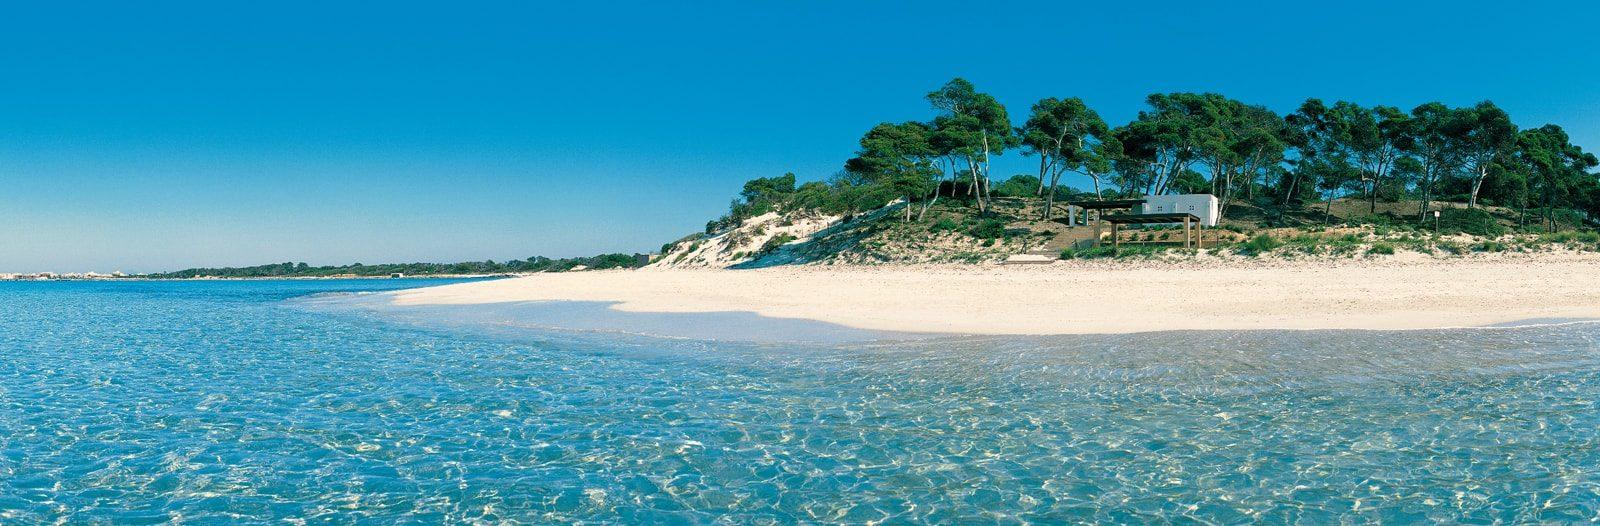 playas-2-min